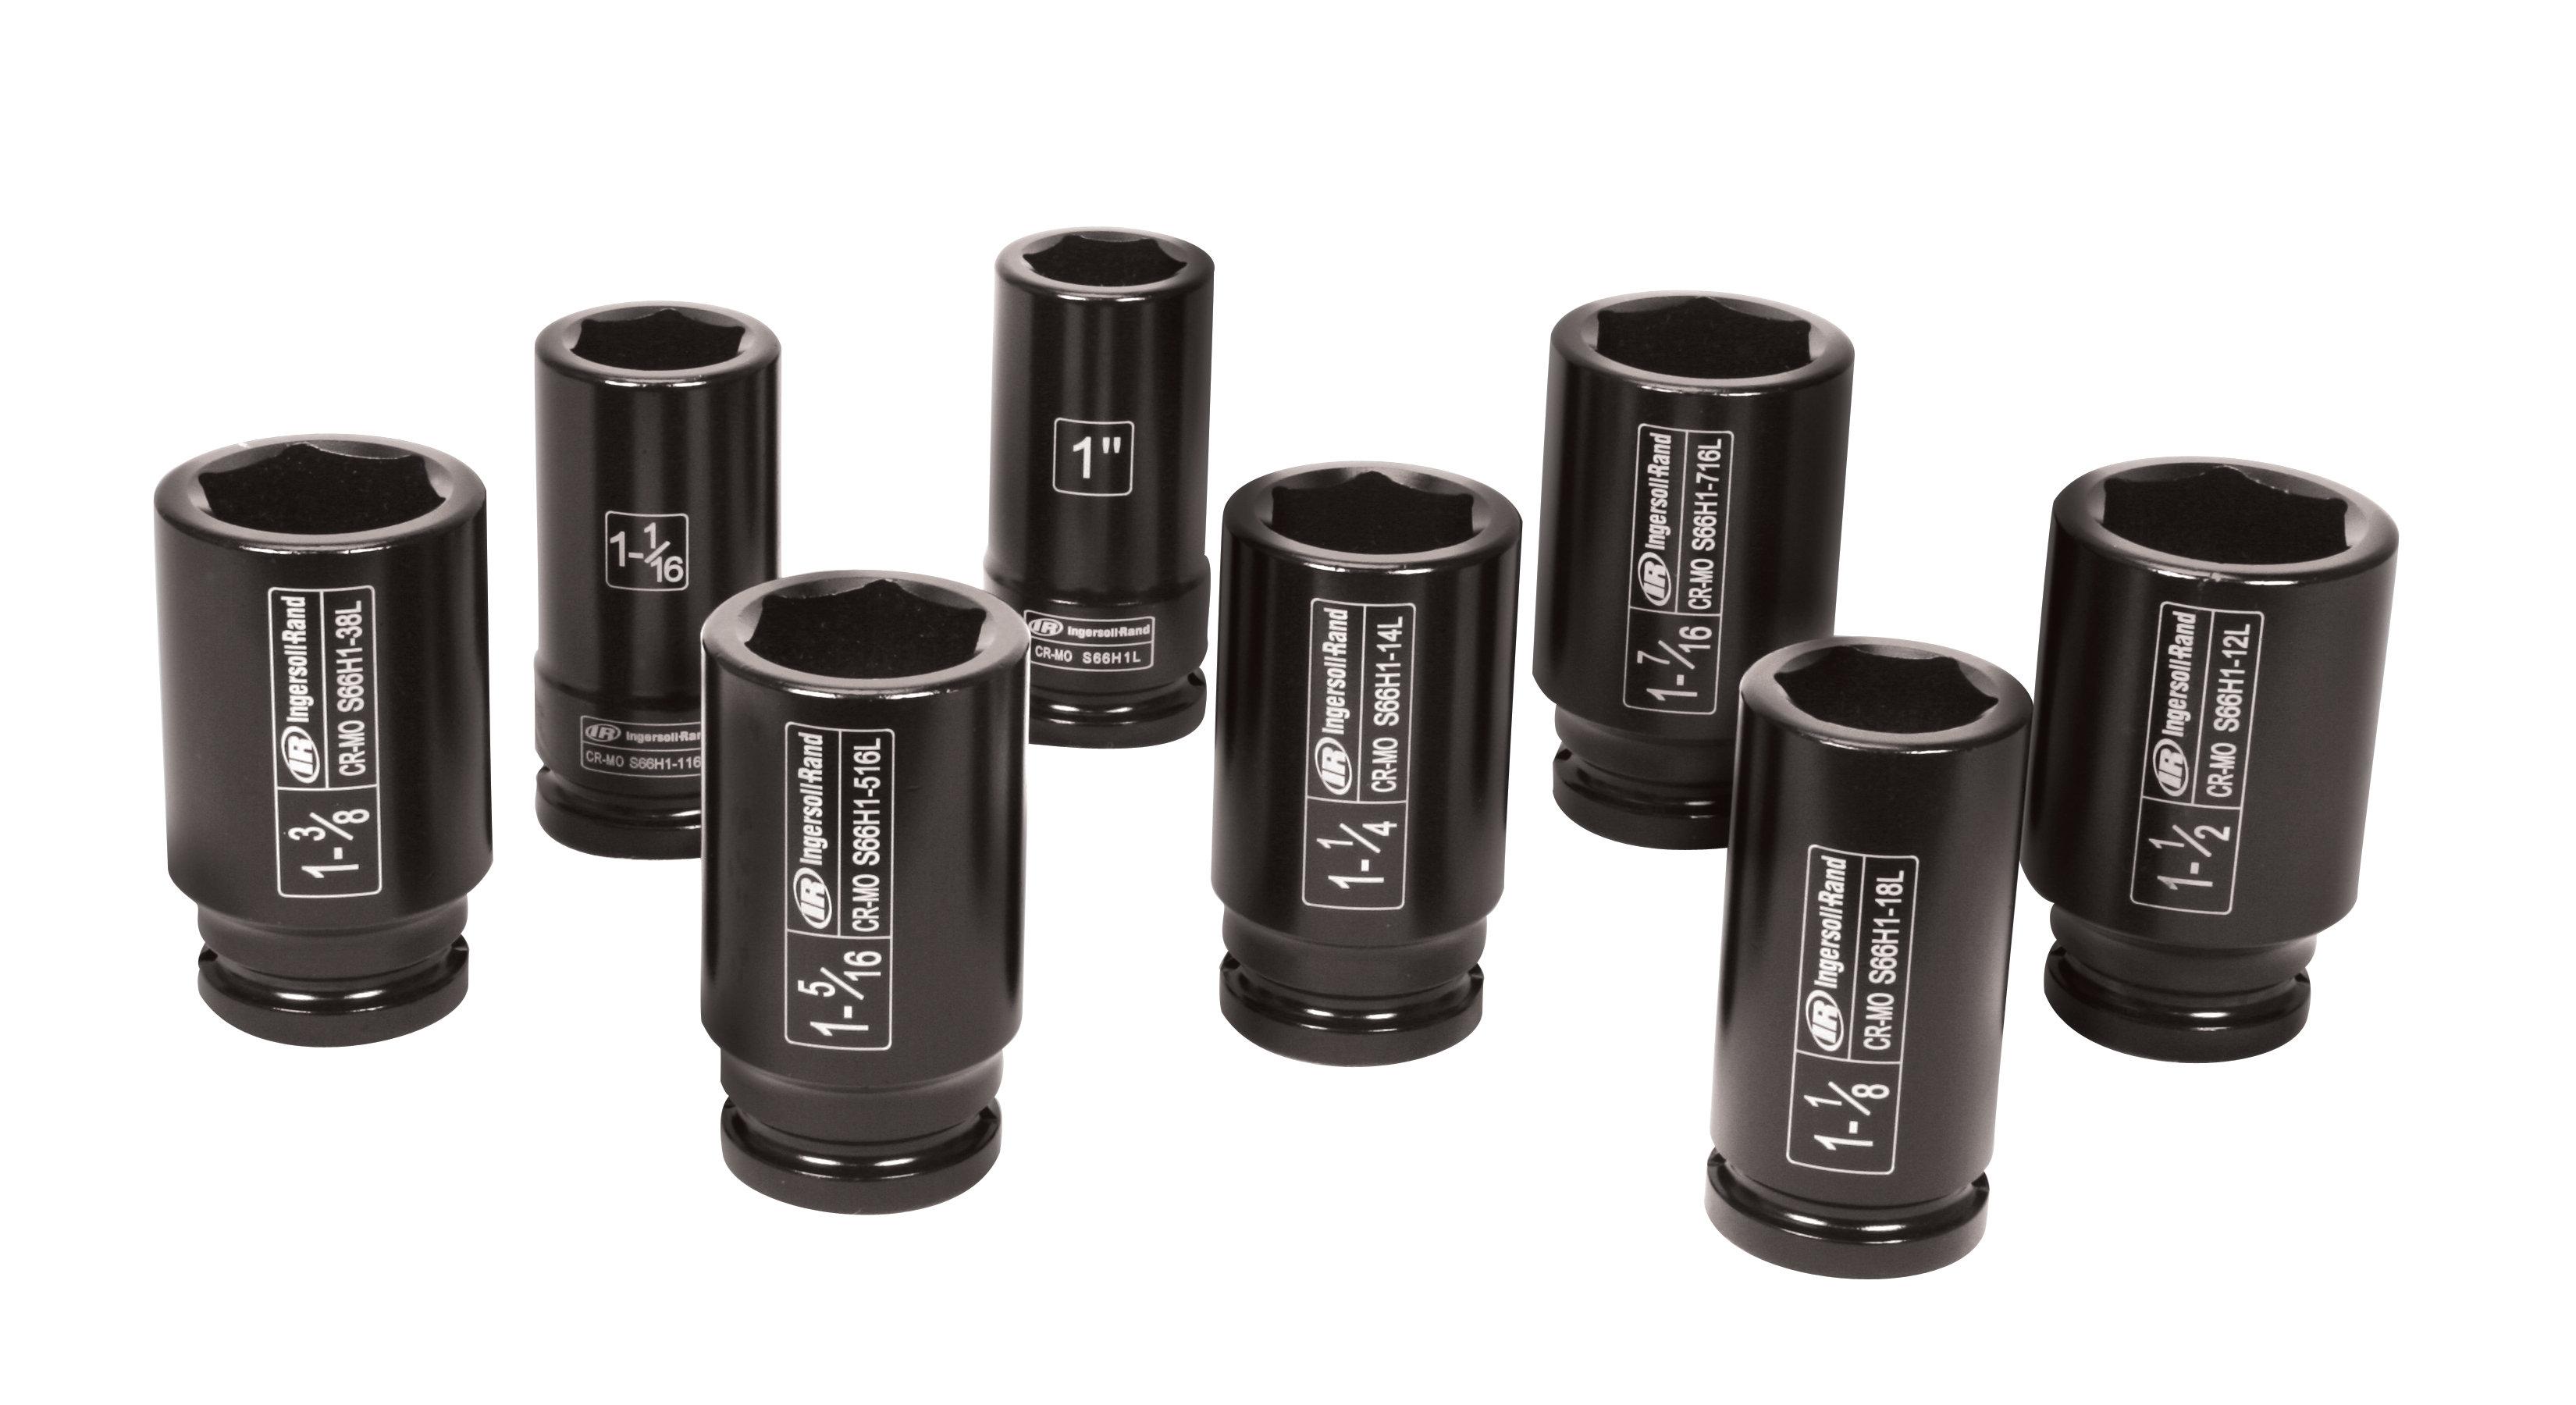 Amazon Com Ingersoll Rand Sk6h8l 3 4 Inch Drive 8 Piece Sae Deep Impact Socket Set Home Improvement